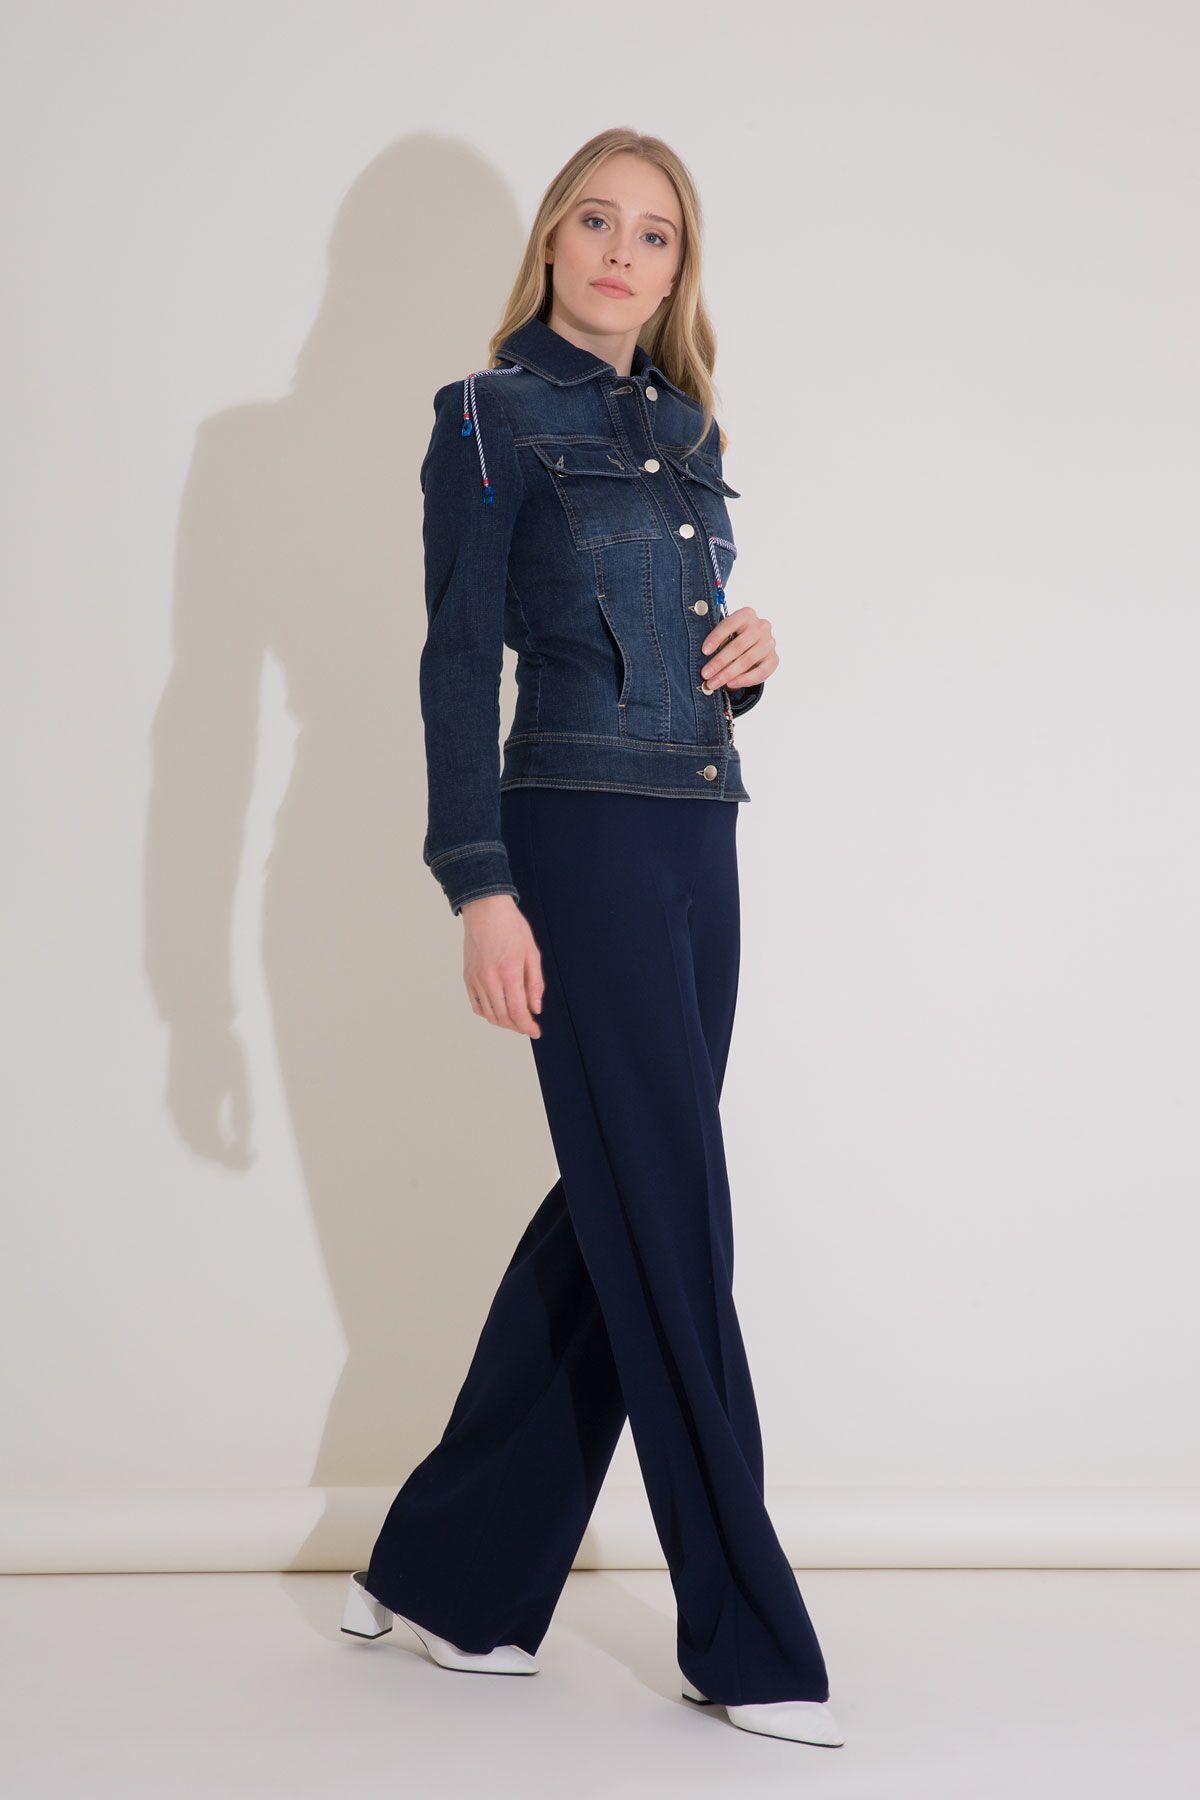 Arma Detaylı Halat Aksesuarlı Lacivert Jean Ceket